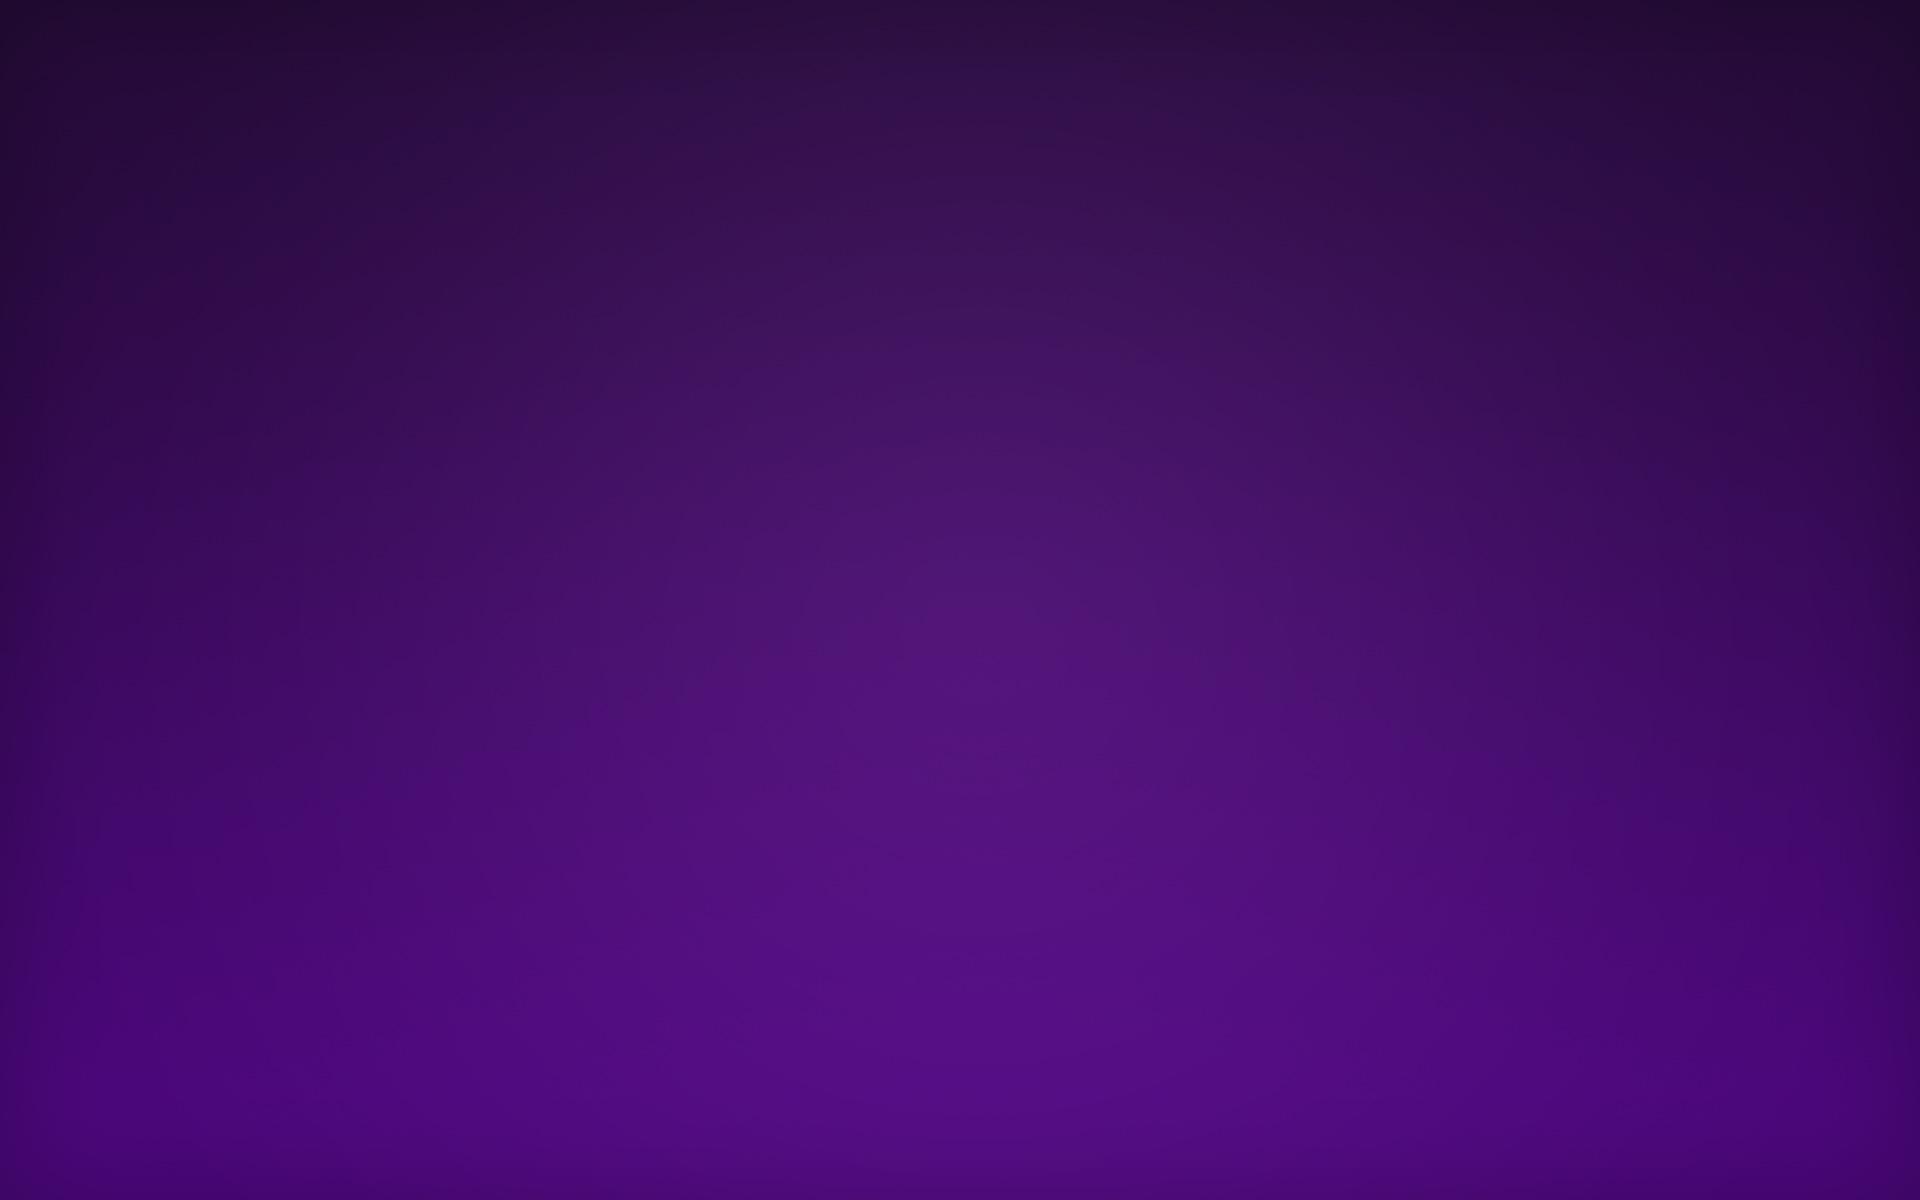 Purple Wallpaper For Computer wallpaper   207458 1920x1200